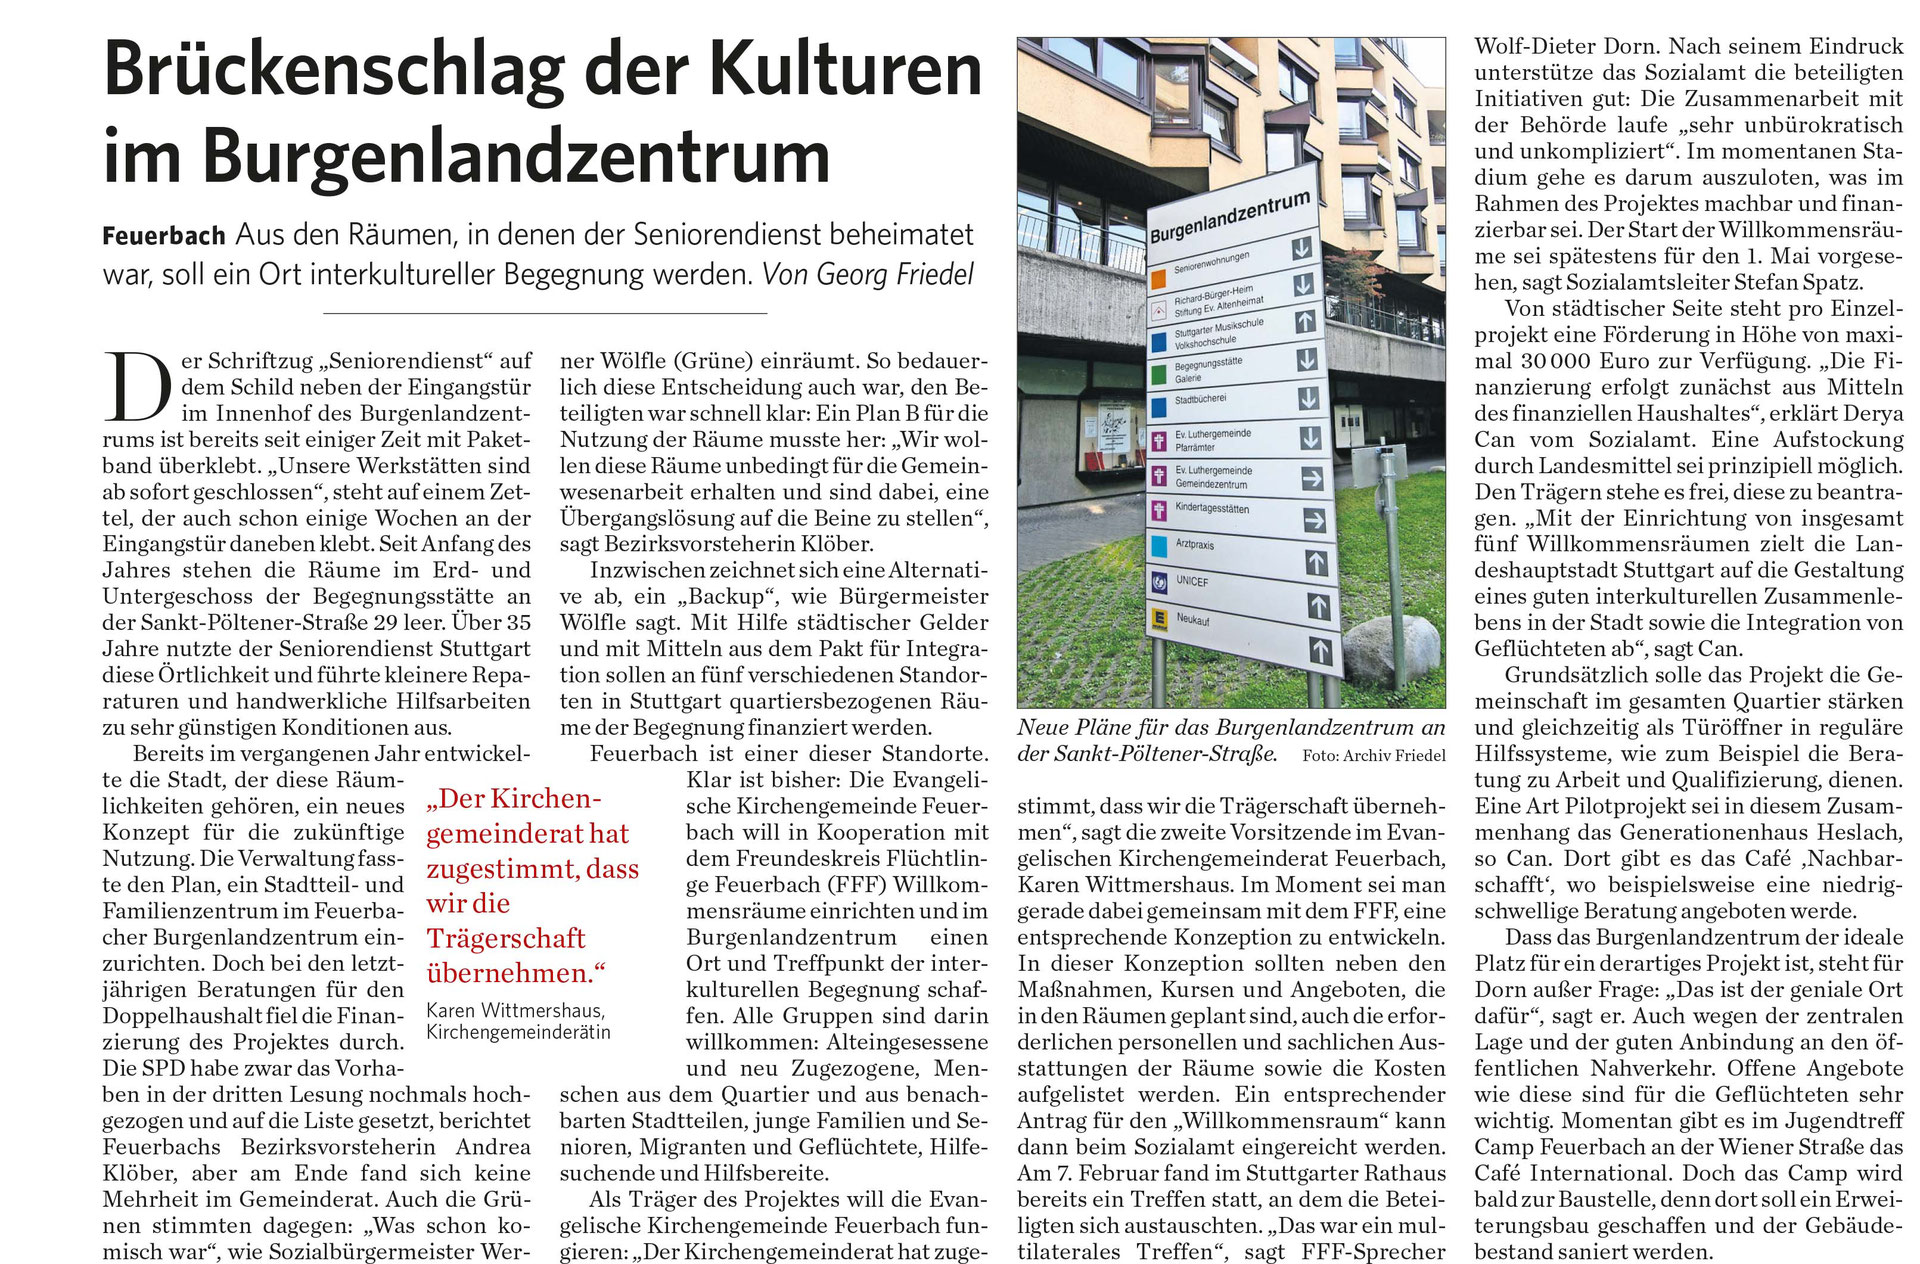 Presse - Freundeskreis Flüchtlinge Feuerbach